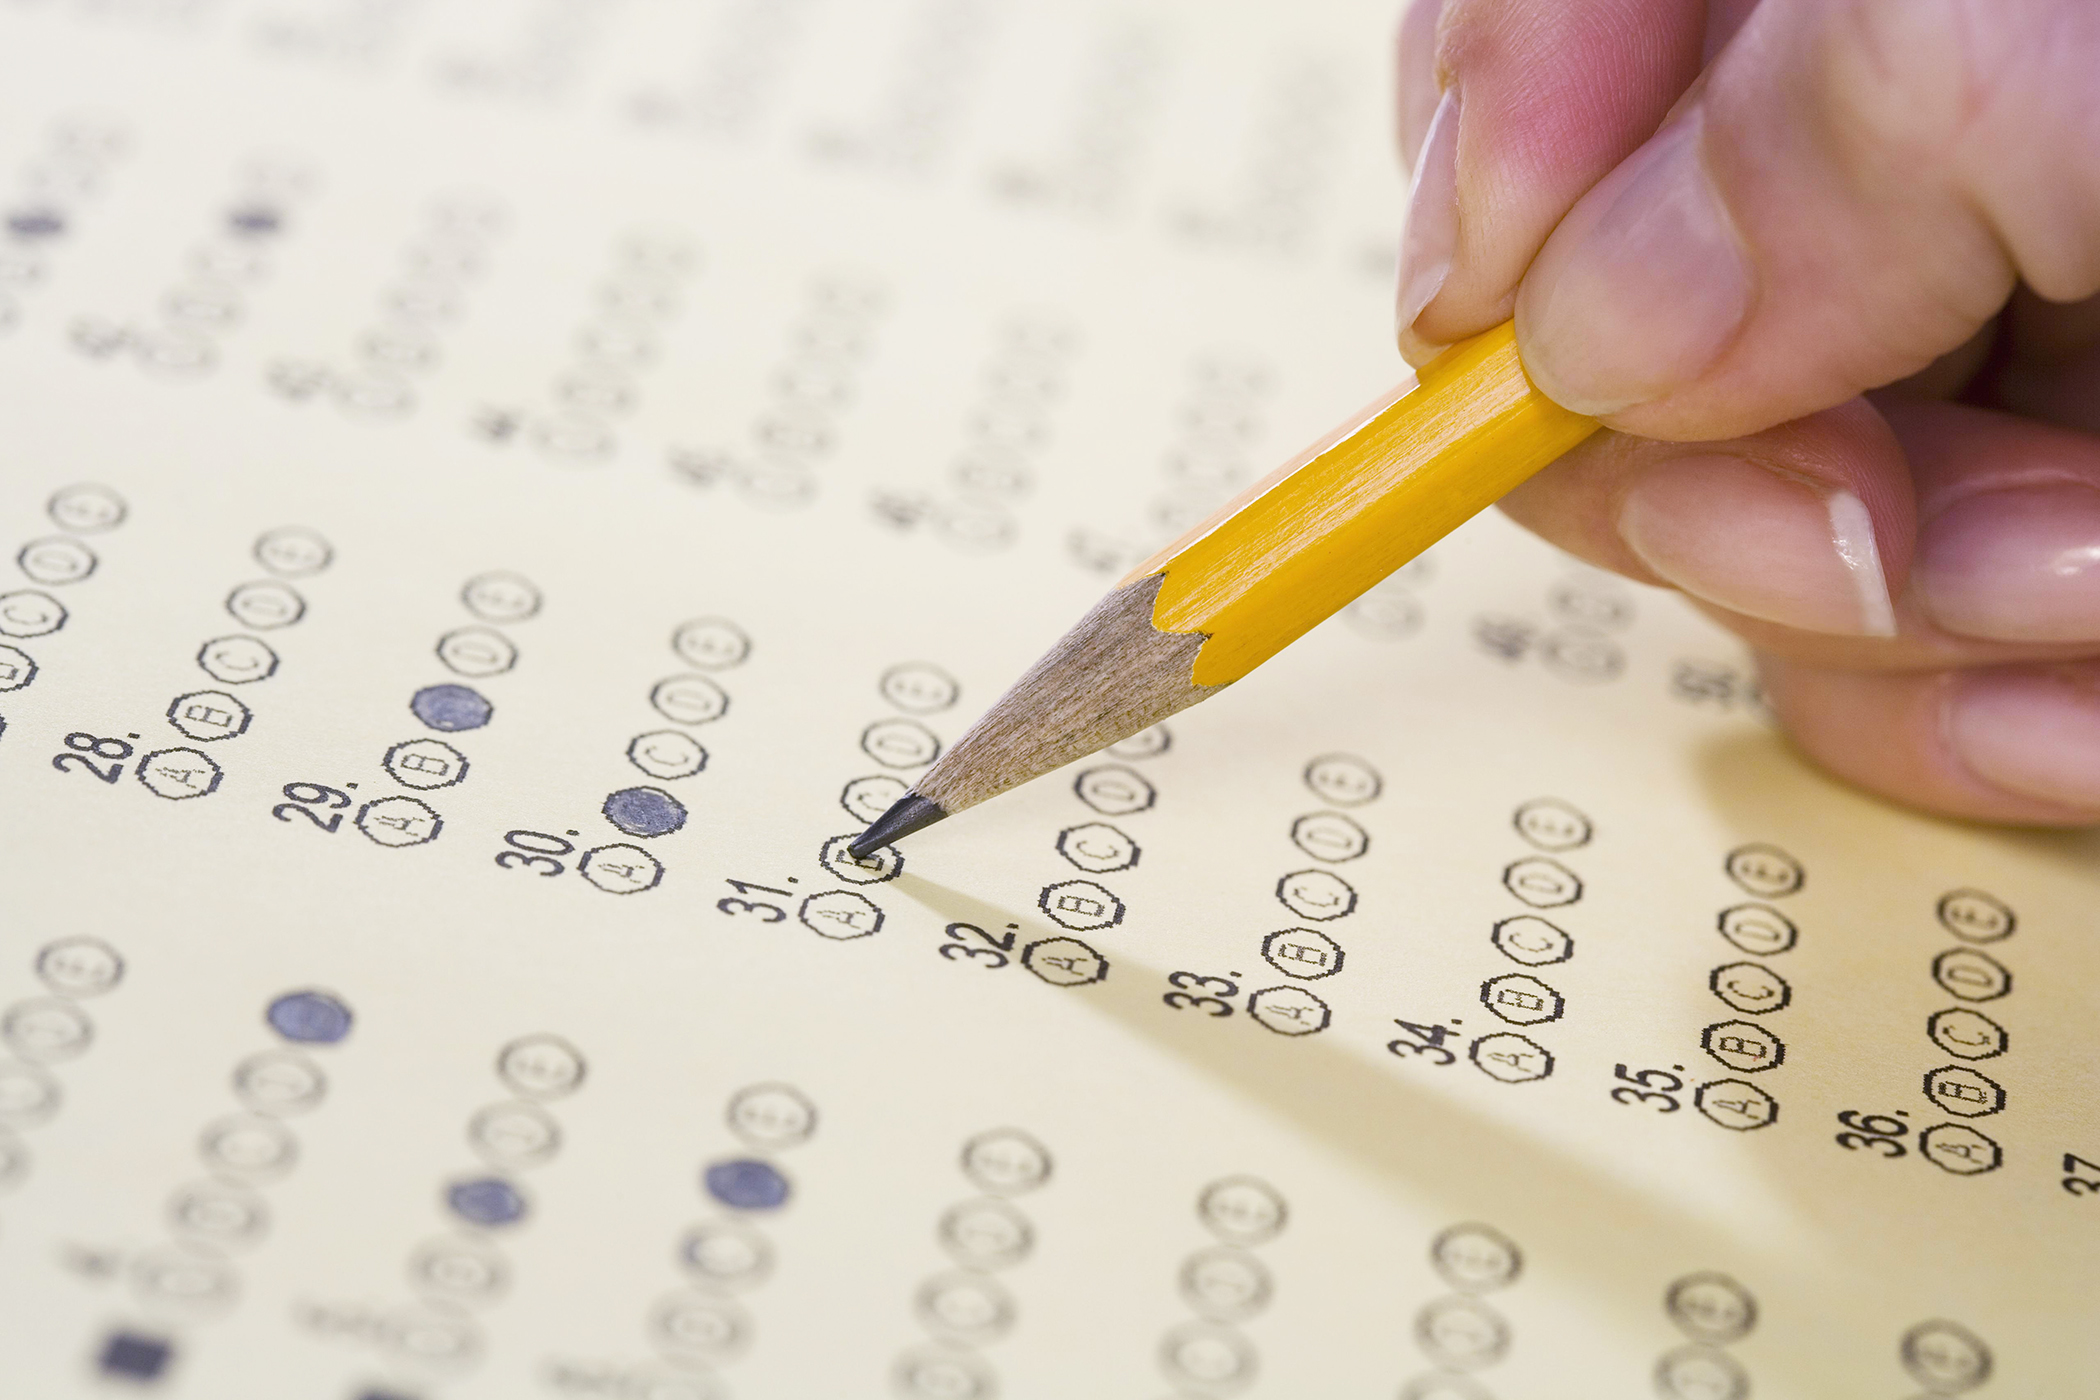 Standerdized test